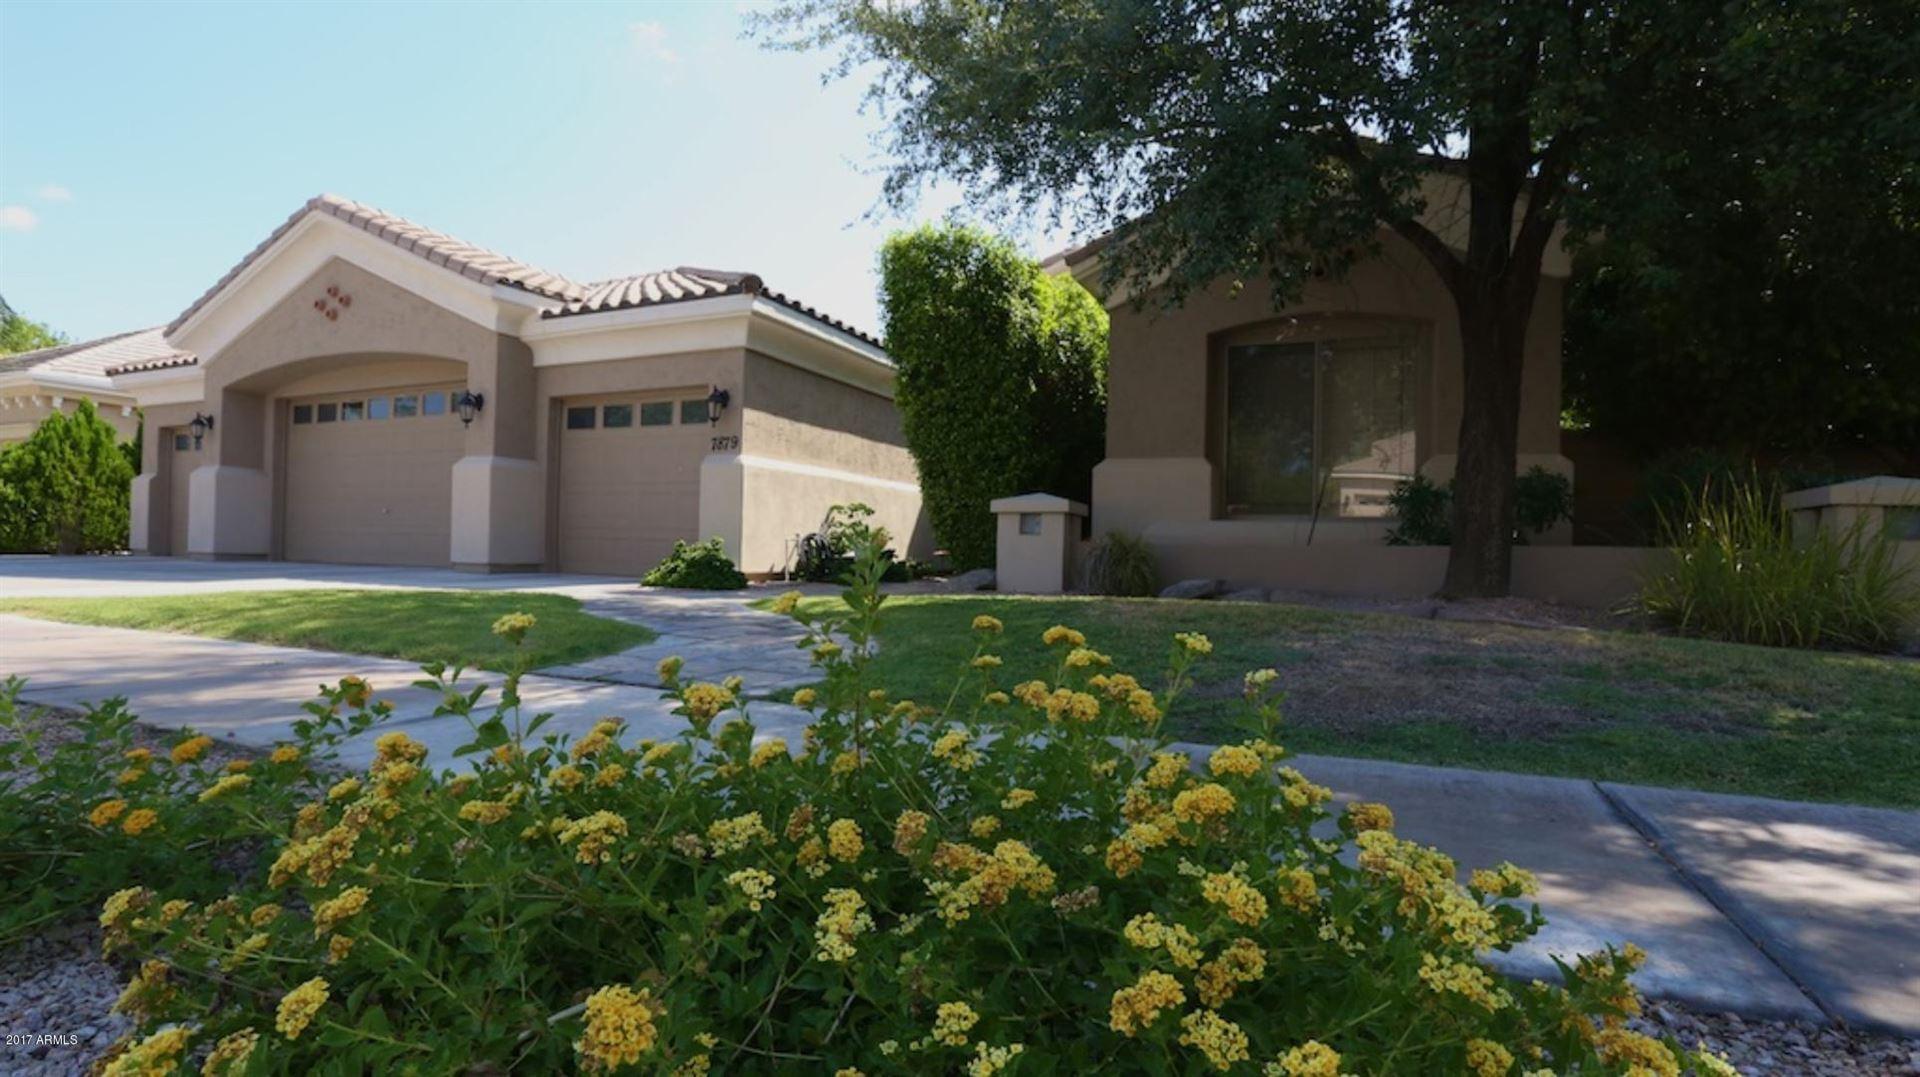 Photo of 7879 S STEPHANIE Lane, Tempe, AZ 85284 (MLS # 6220496)